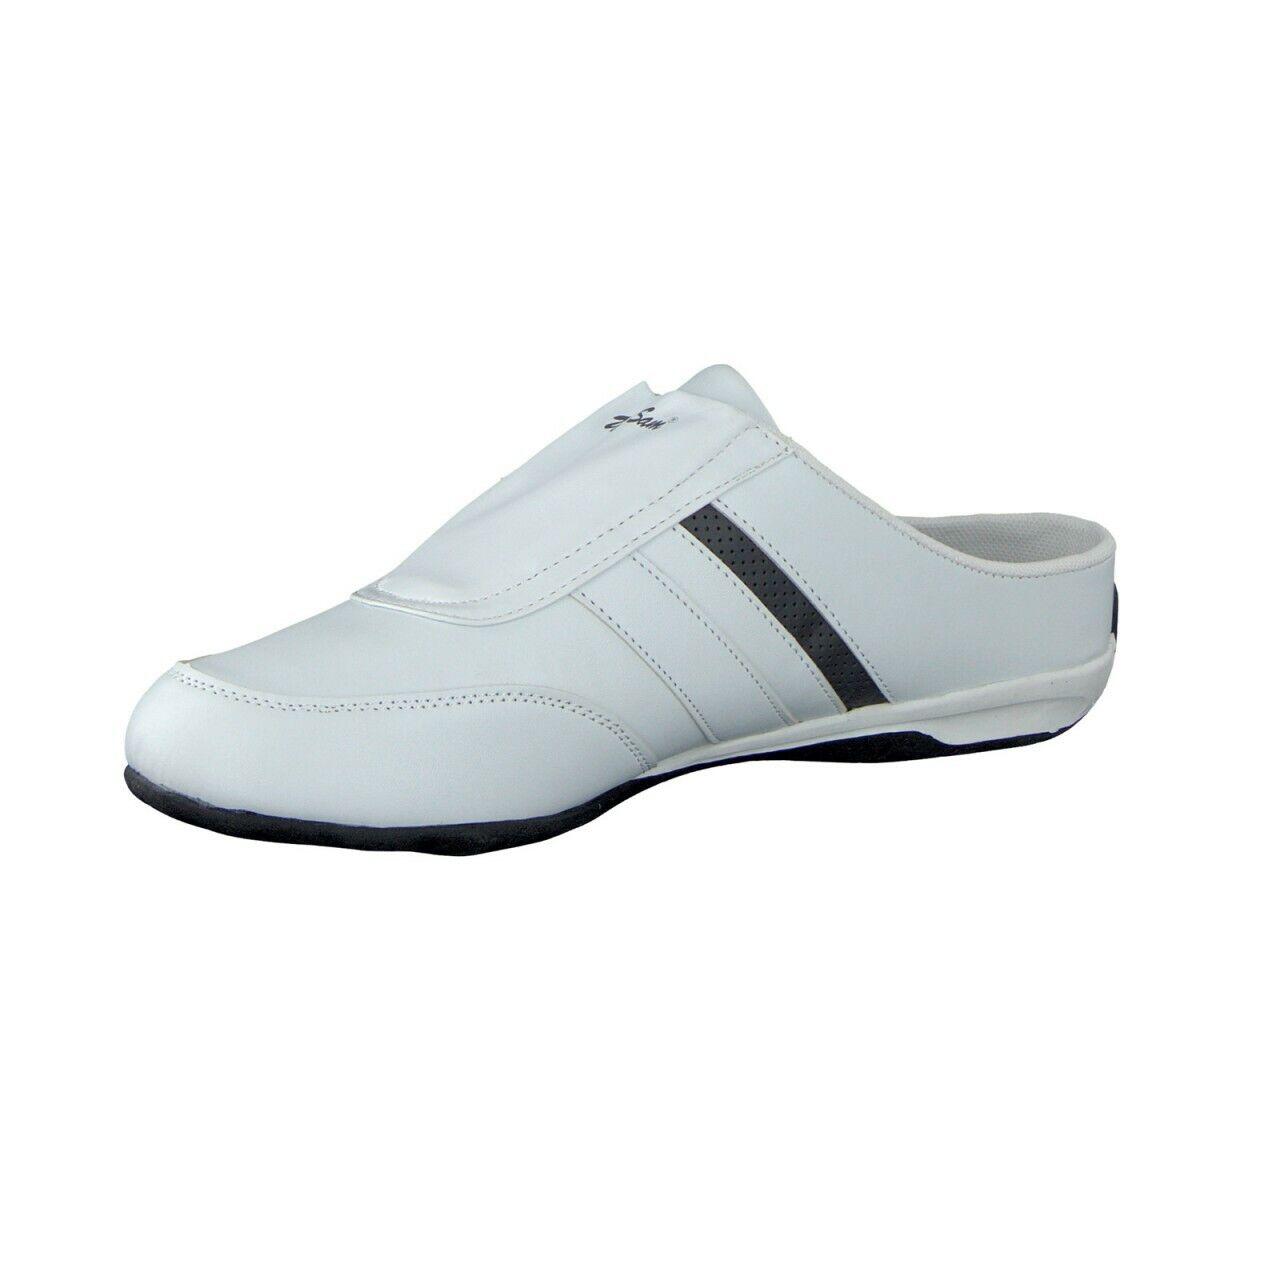 4a27866d3 Sam men Sabots Sneakers con Righe